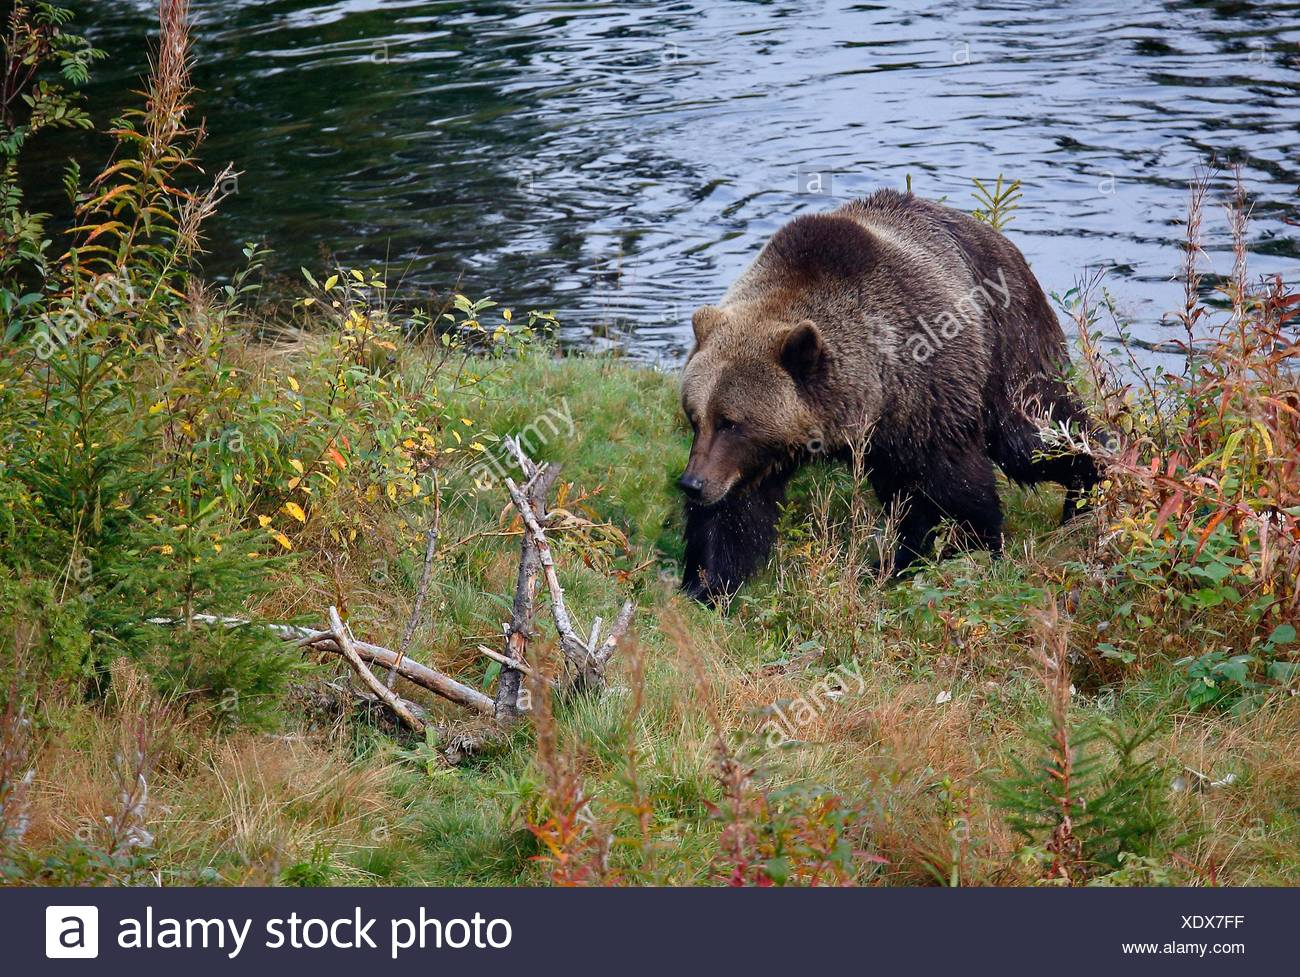 Brown bear Ursus arctos Dalarna Sweden - Stock Image